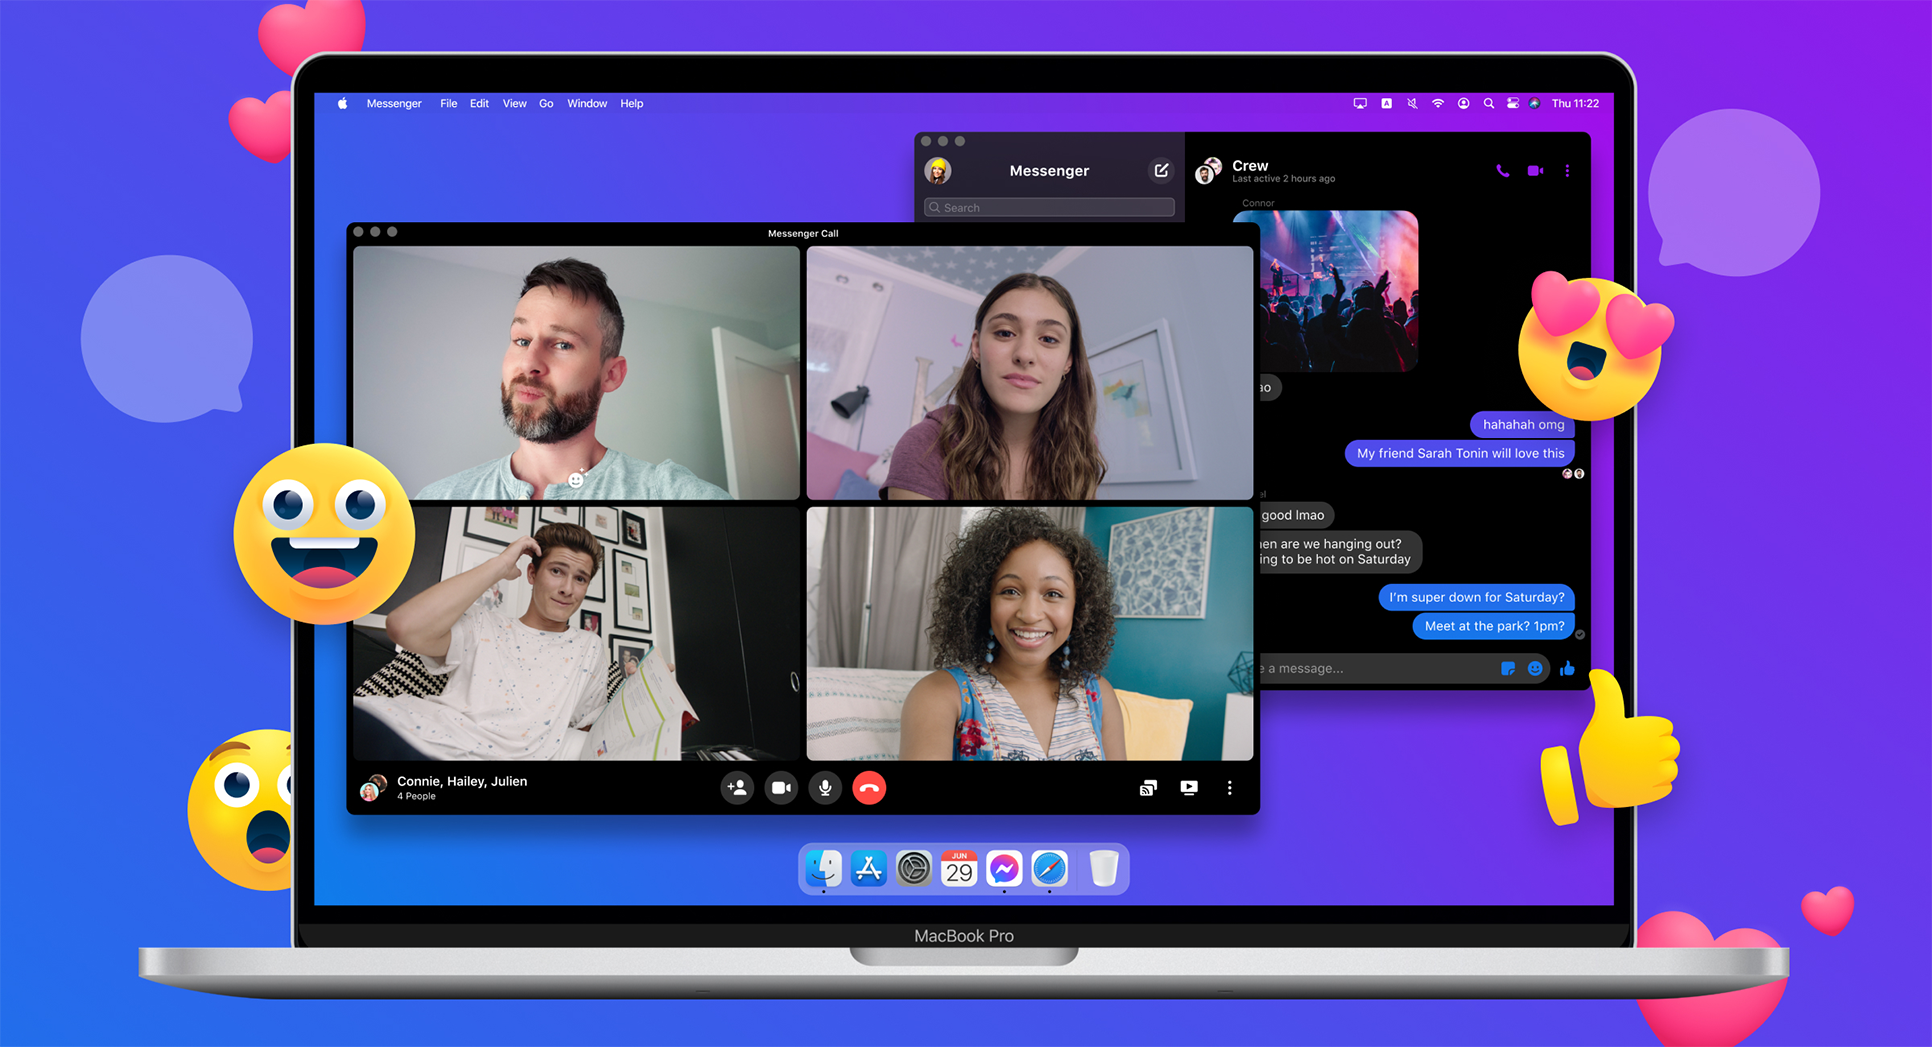 Screenshot of the Messenger app on macOS